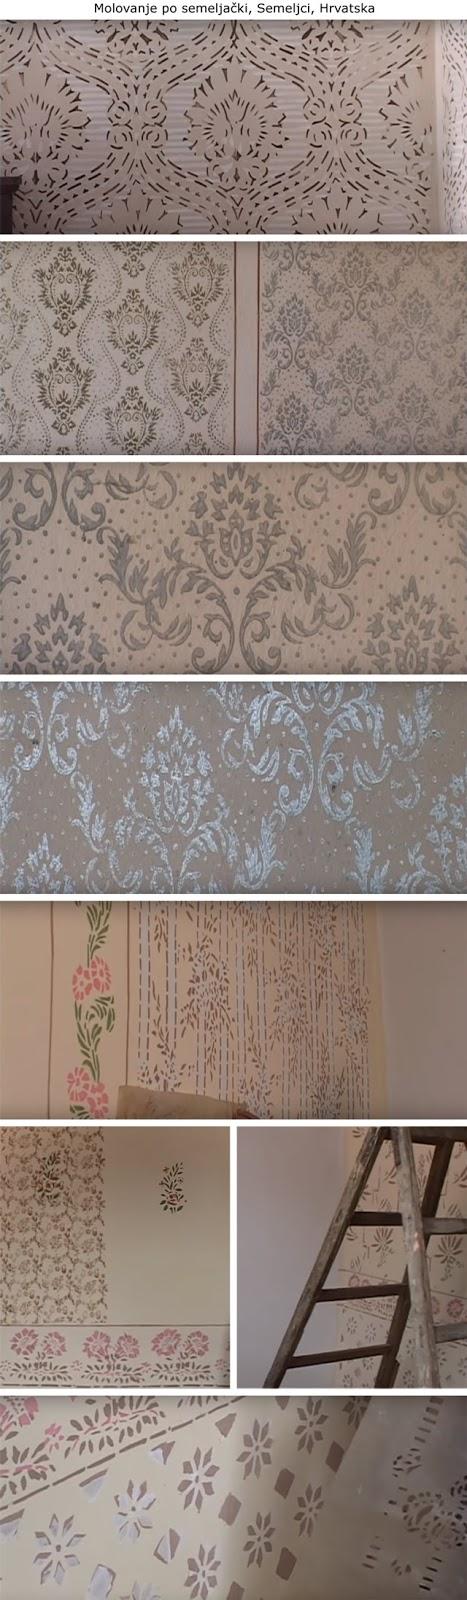 decorazione, rulli decorativi vintage, wall painting, vintage patterned paint rollers, starinski reljefni valjci za moleraj